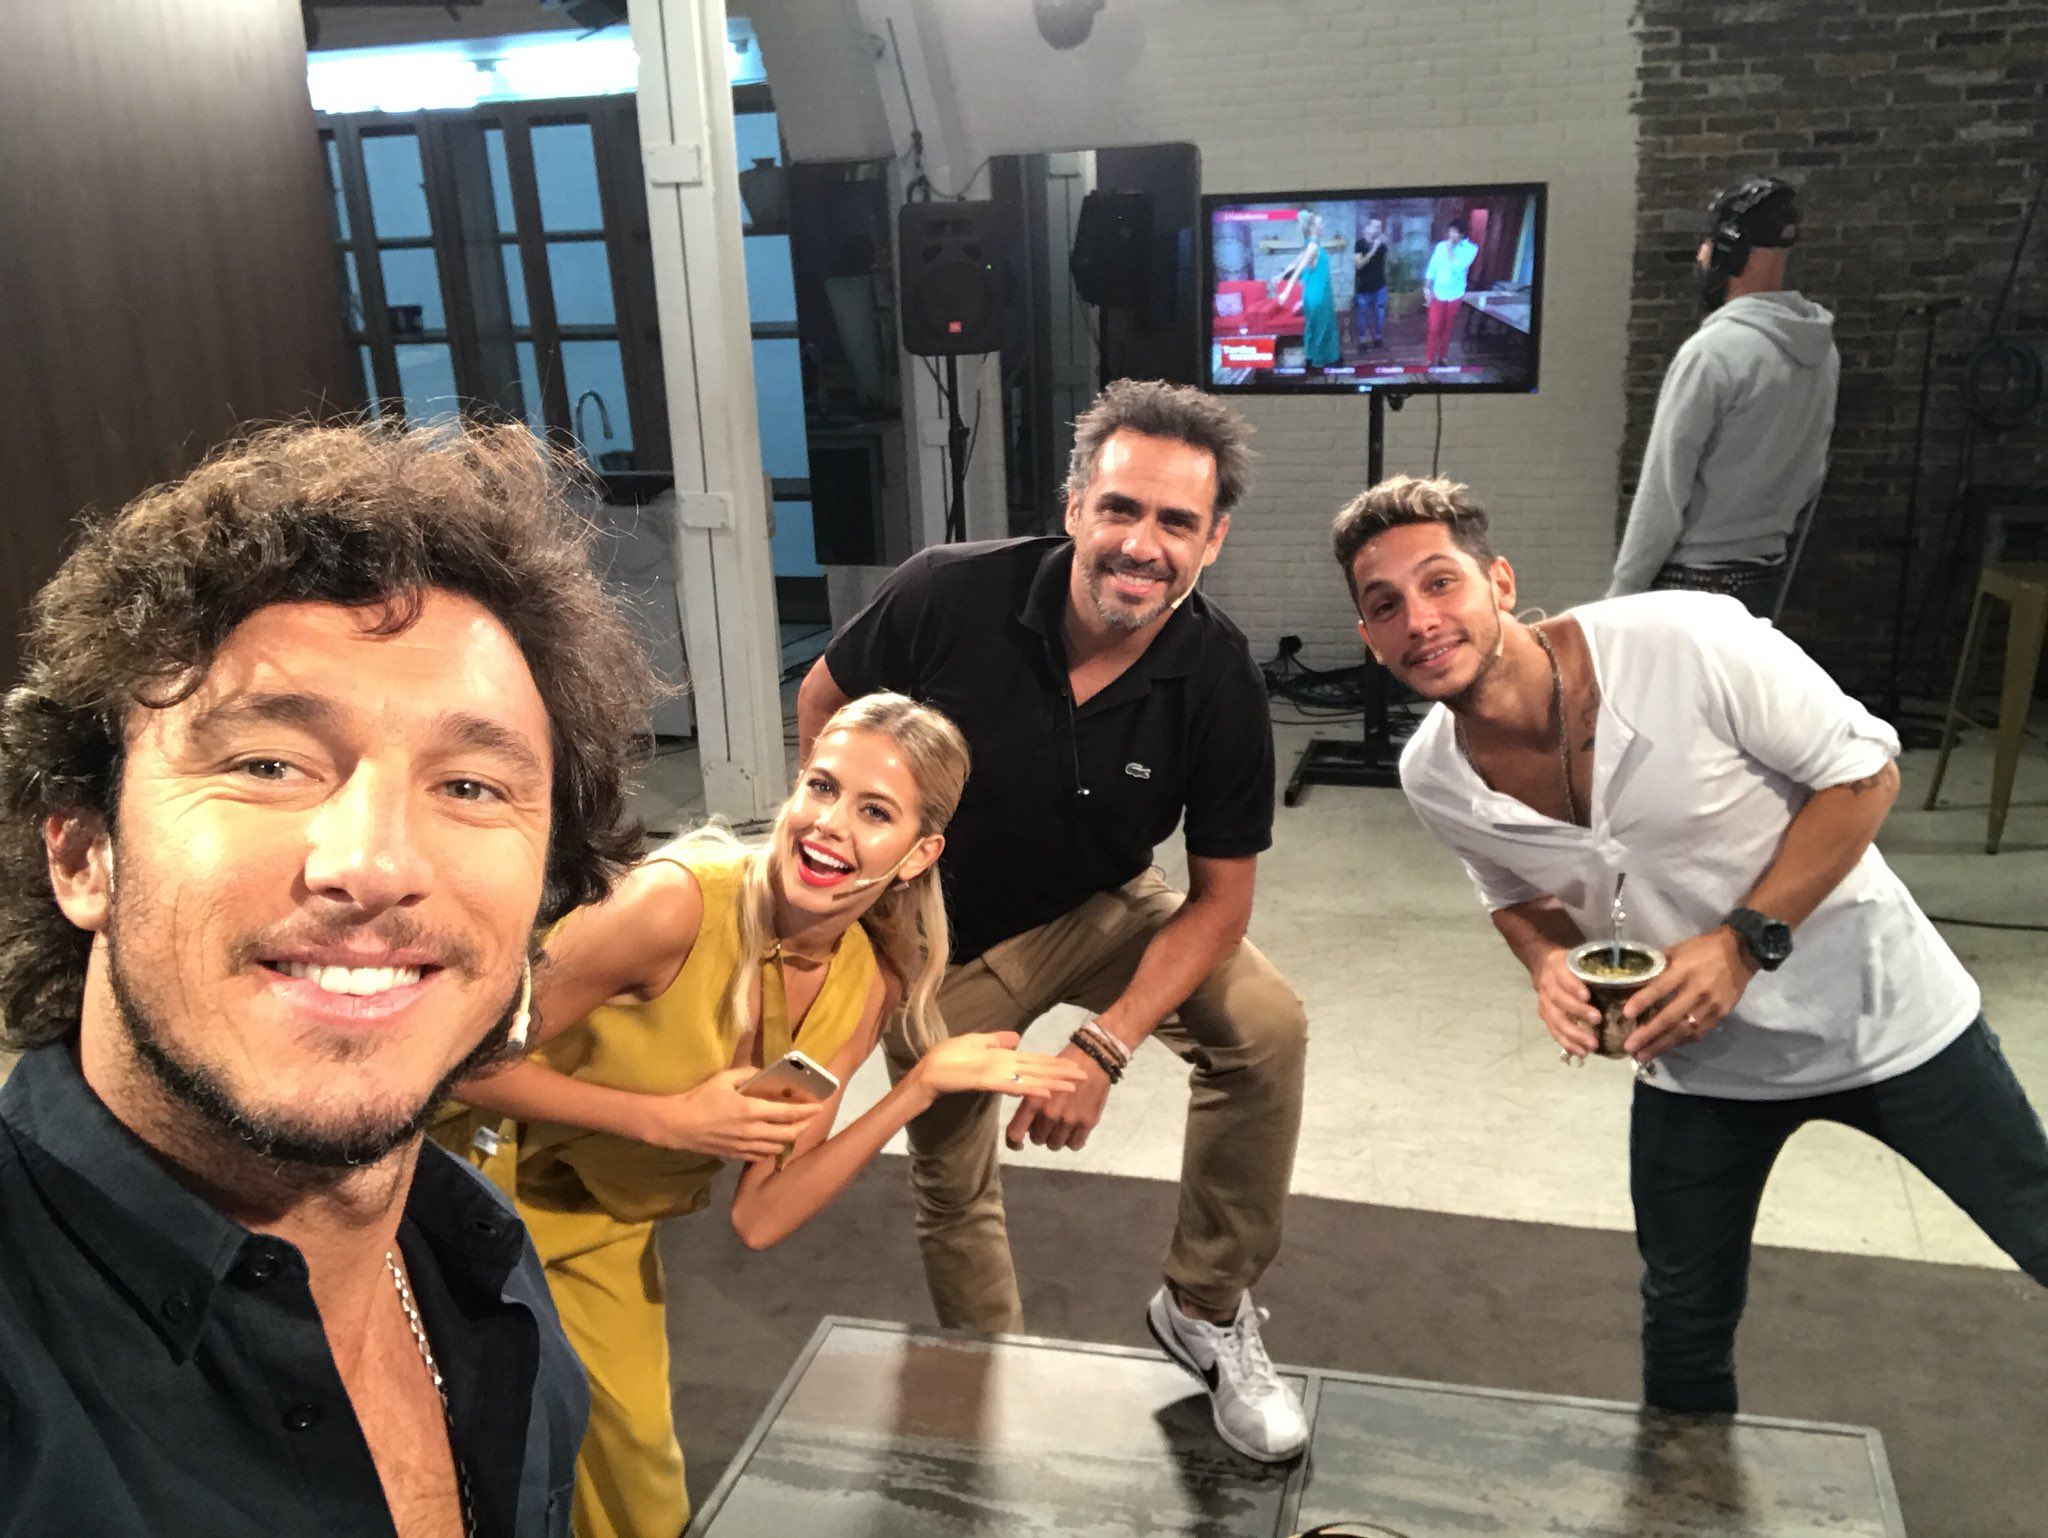 Yaaa al aire !! @ConAmigosAsi  Seguilo en cablevision canal 30     O por YouTube aqui    https://t.co/myOztNmS1c https://t.co/RSBsIfSg8c